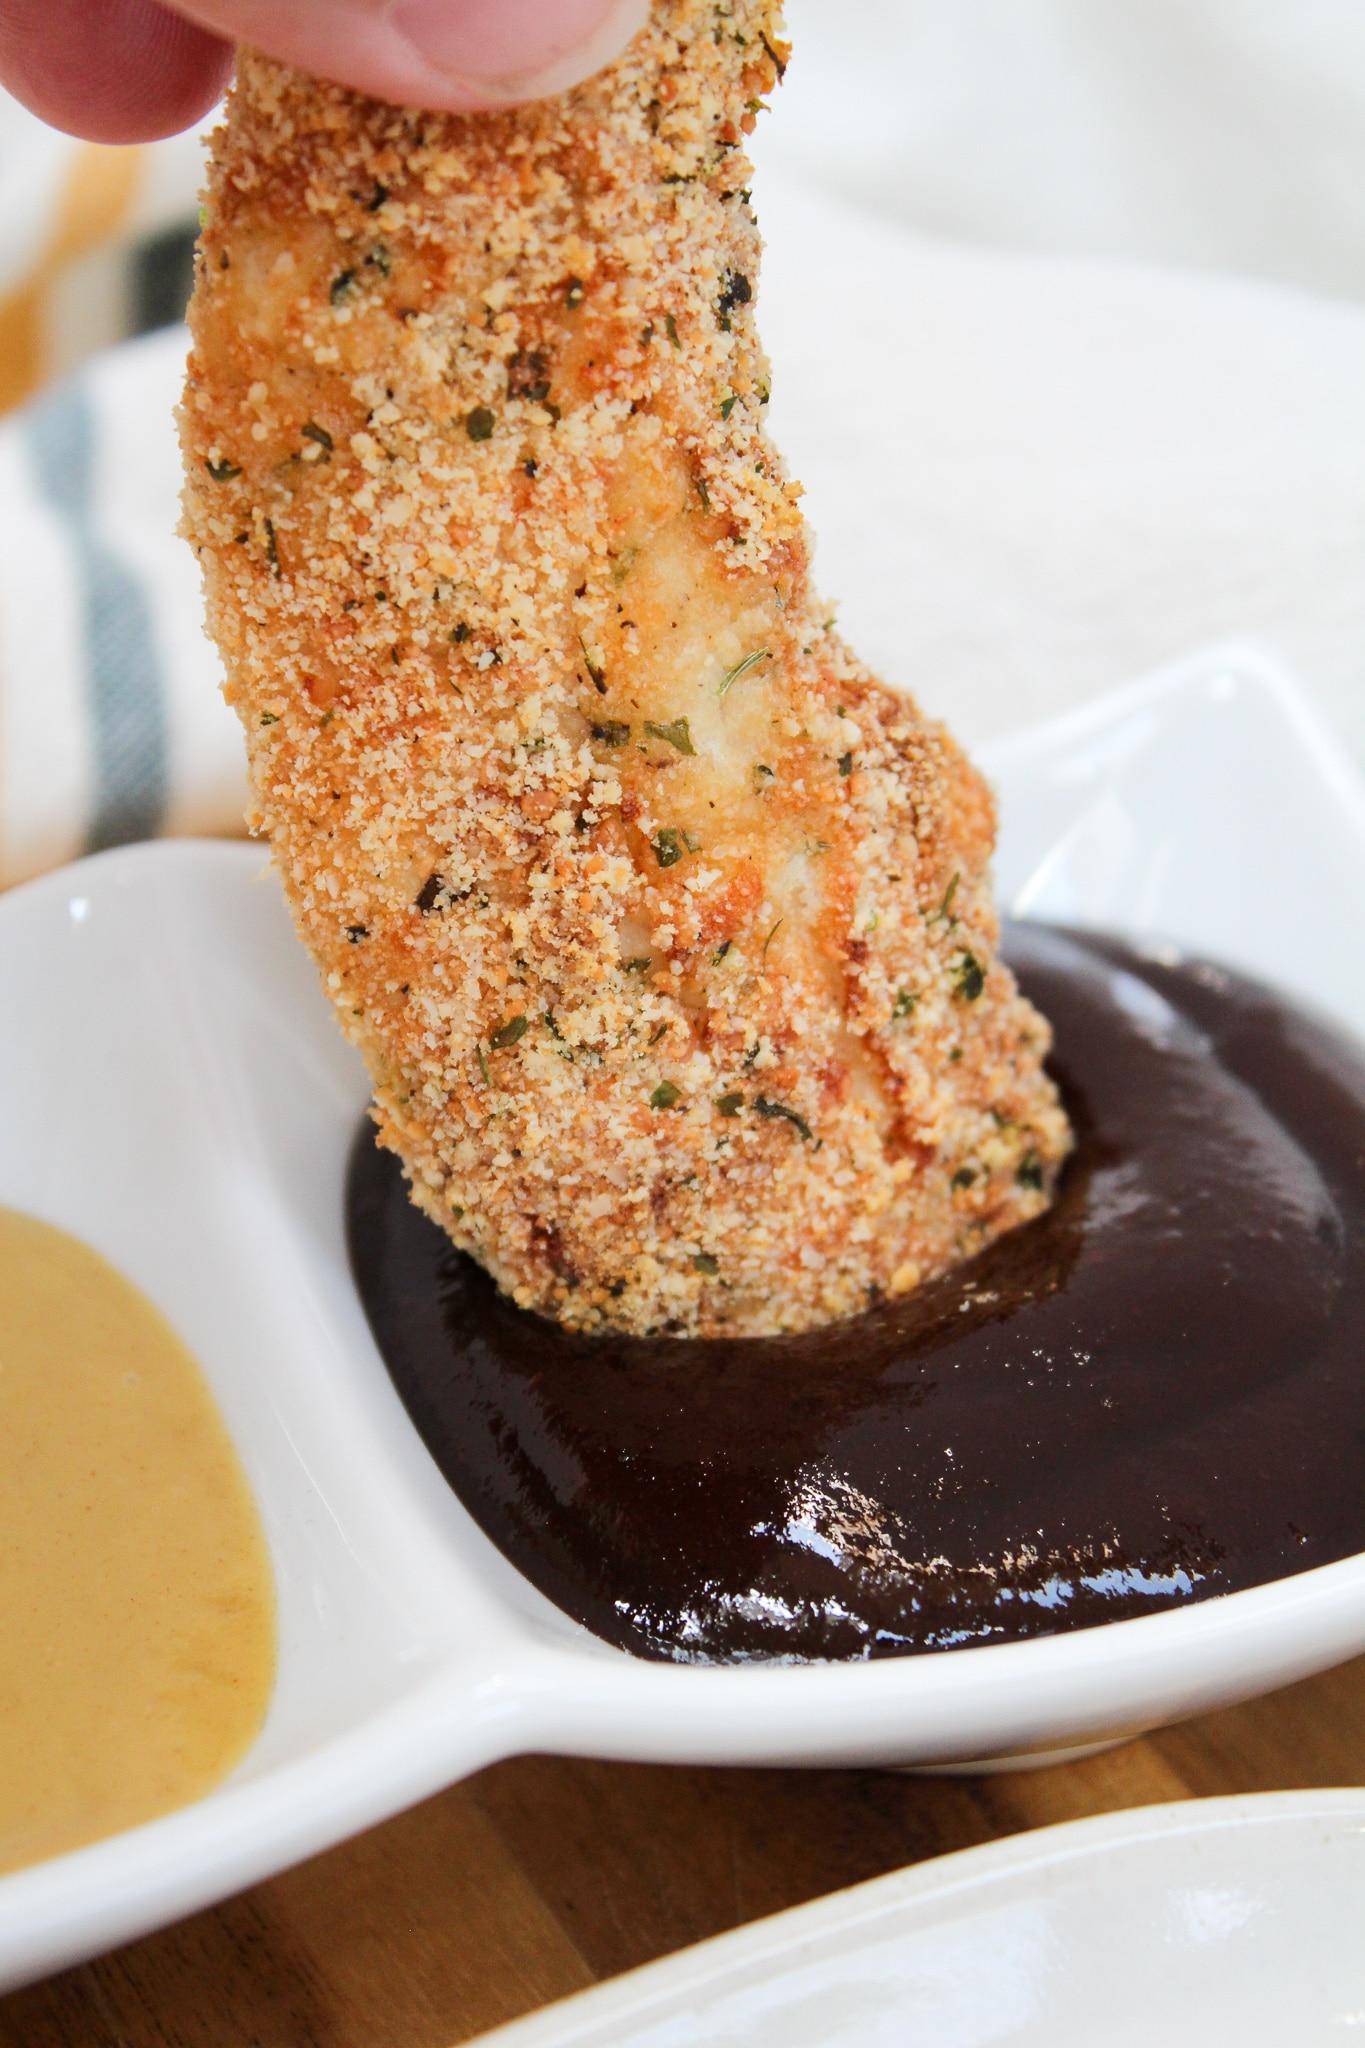 chicken tender with bbq sauce